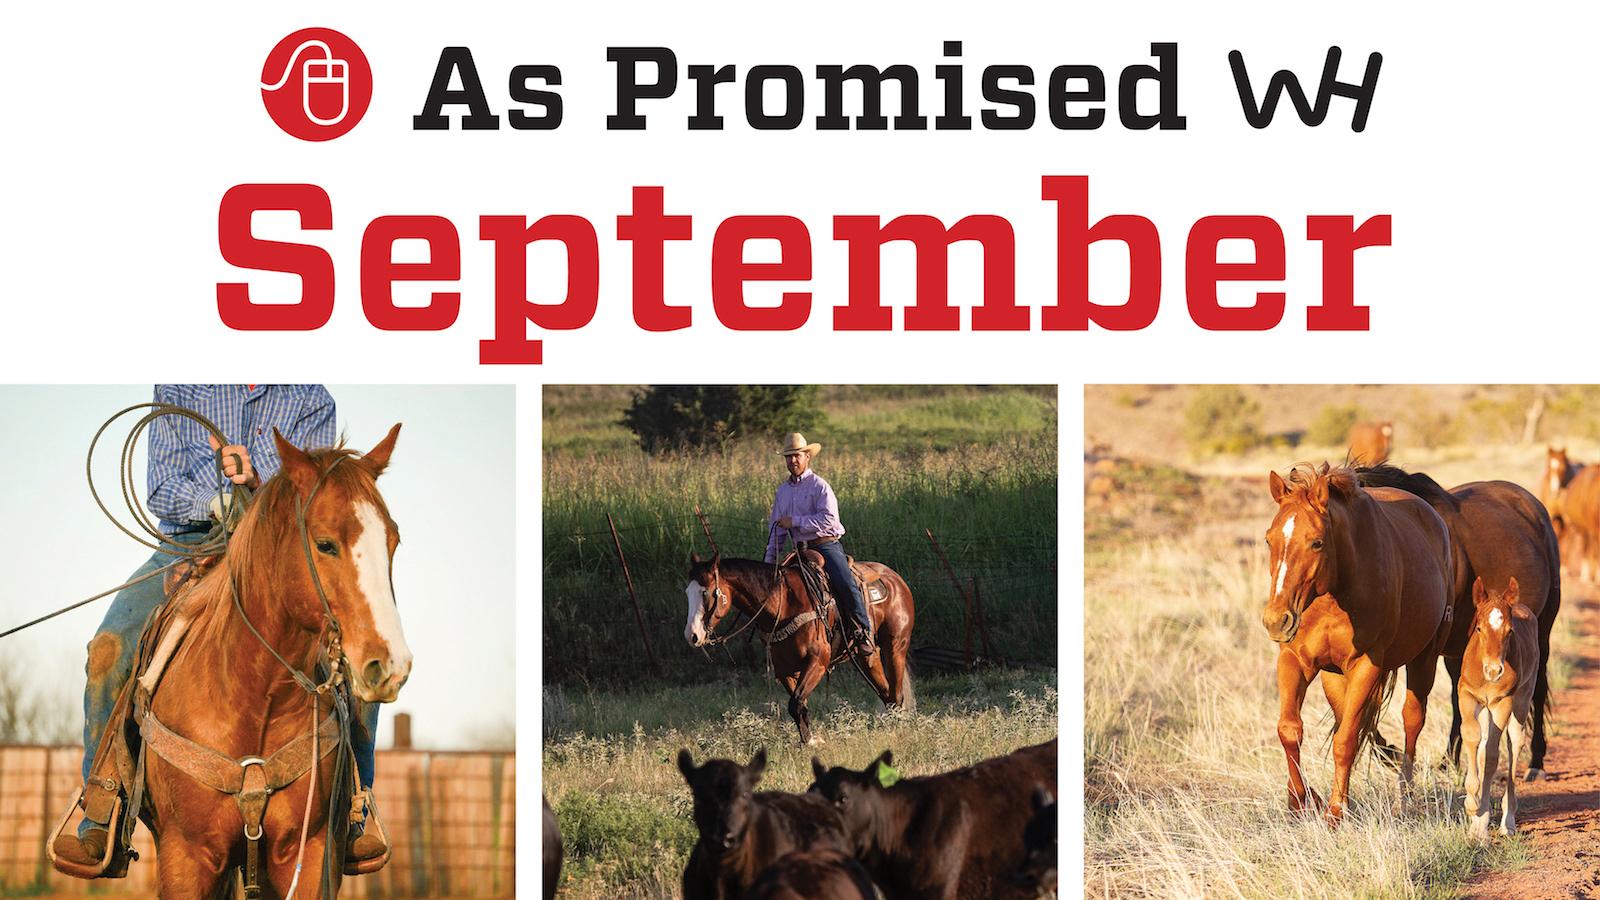 October 2020 western horseman magazine promised content